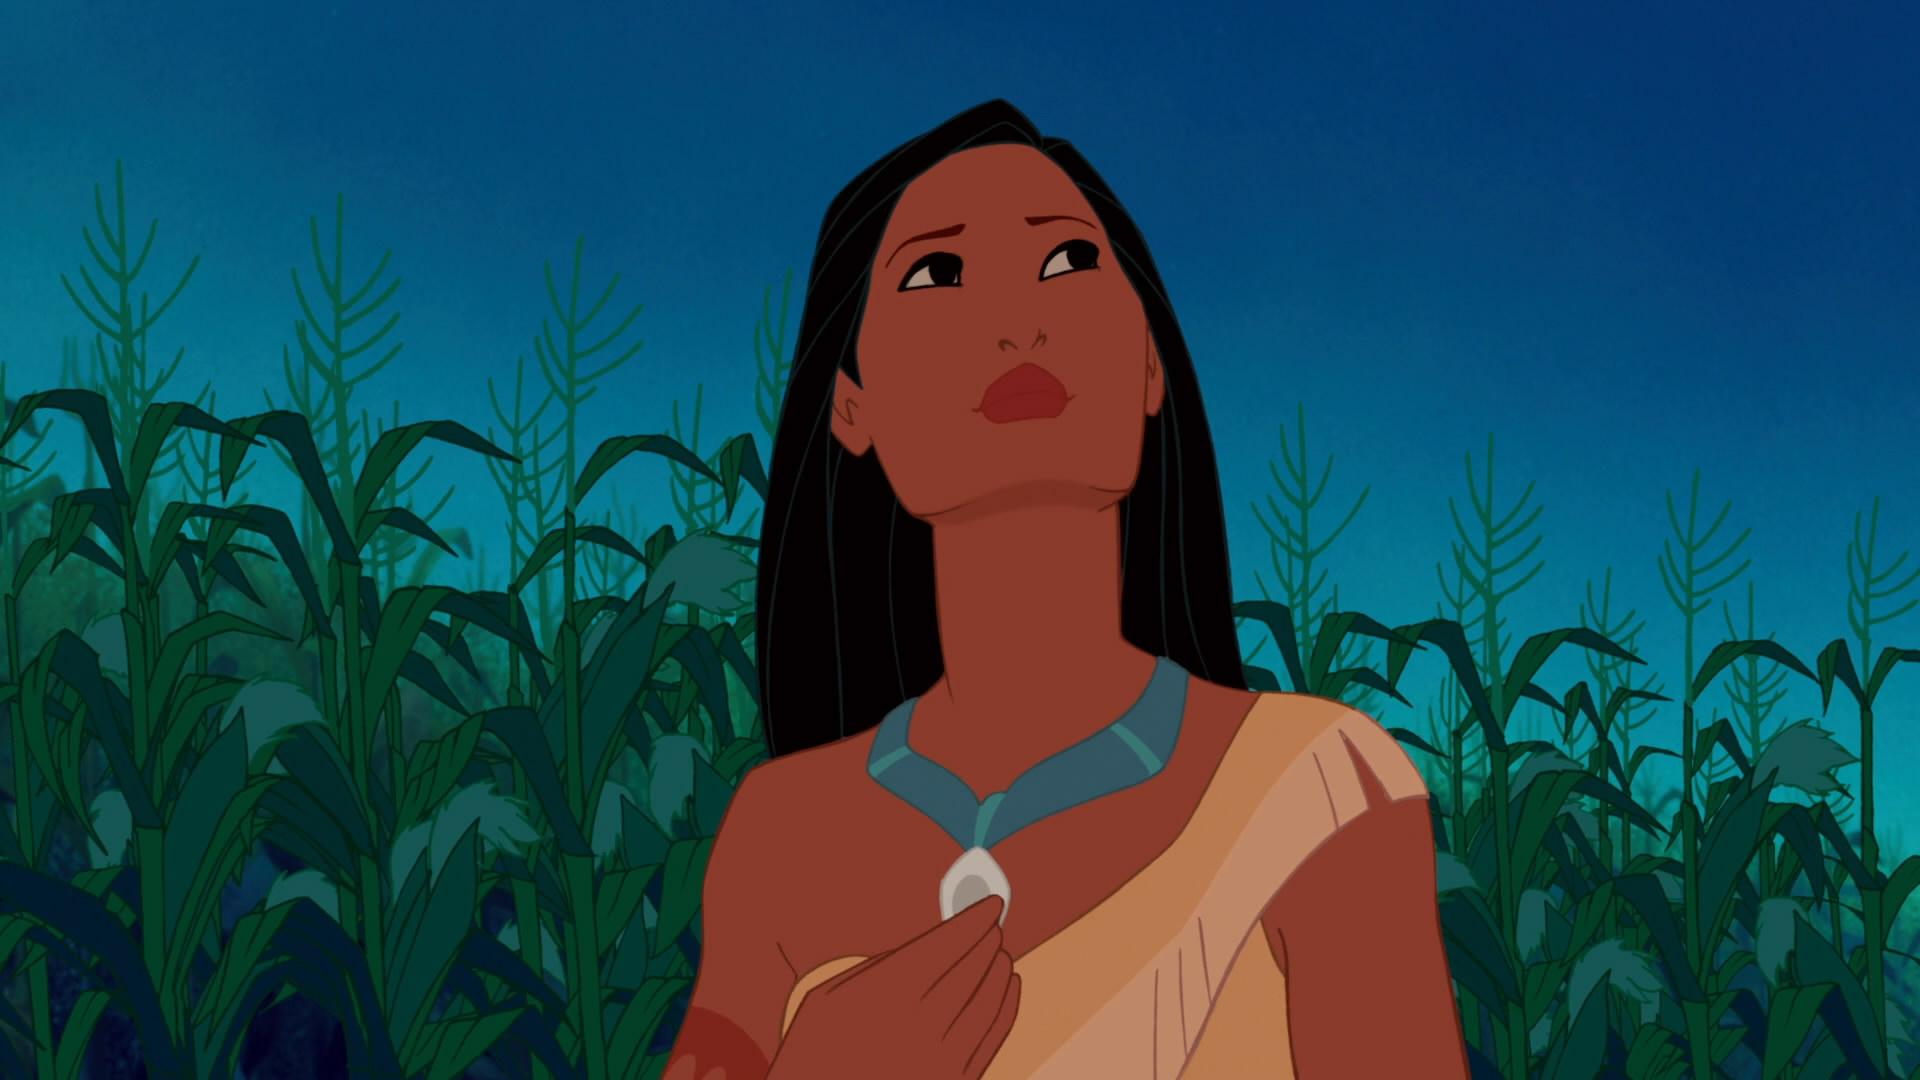 Pocahontas.1995.BluRay.1080p.Rus.Eng.x264-CHD.mkv_snapshot_00.46.12_[2012.04.01_10.36.15].jpg